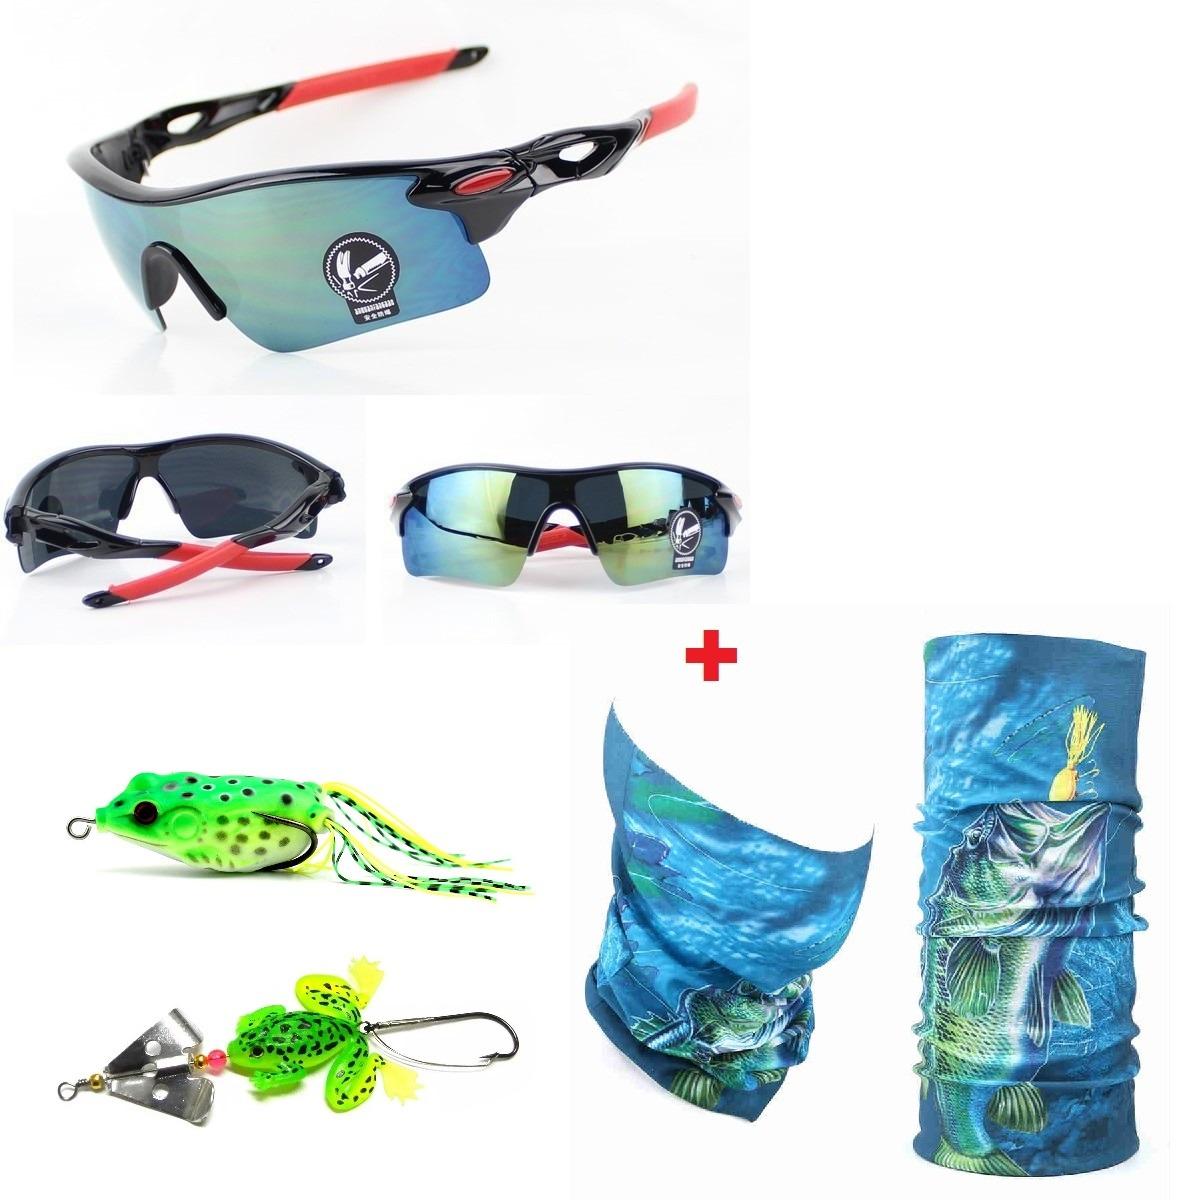 2e0b225f2 Kit Pesca Bandana Óculos 2 Isca Frog Traíra Buzz Bait Barato - R ...